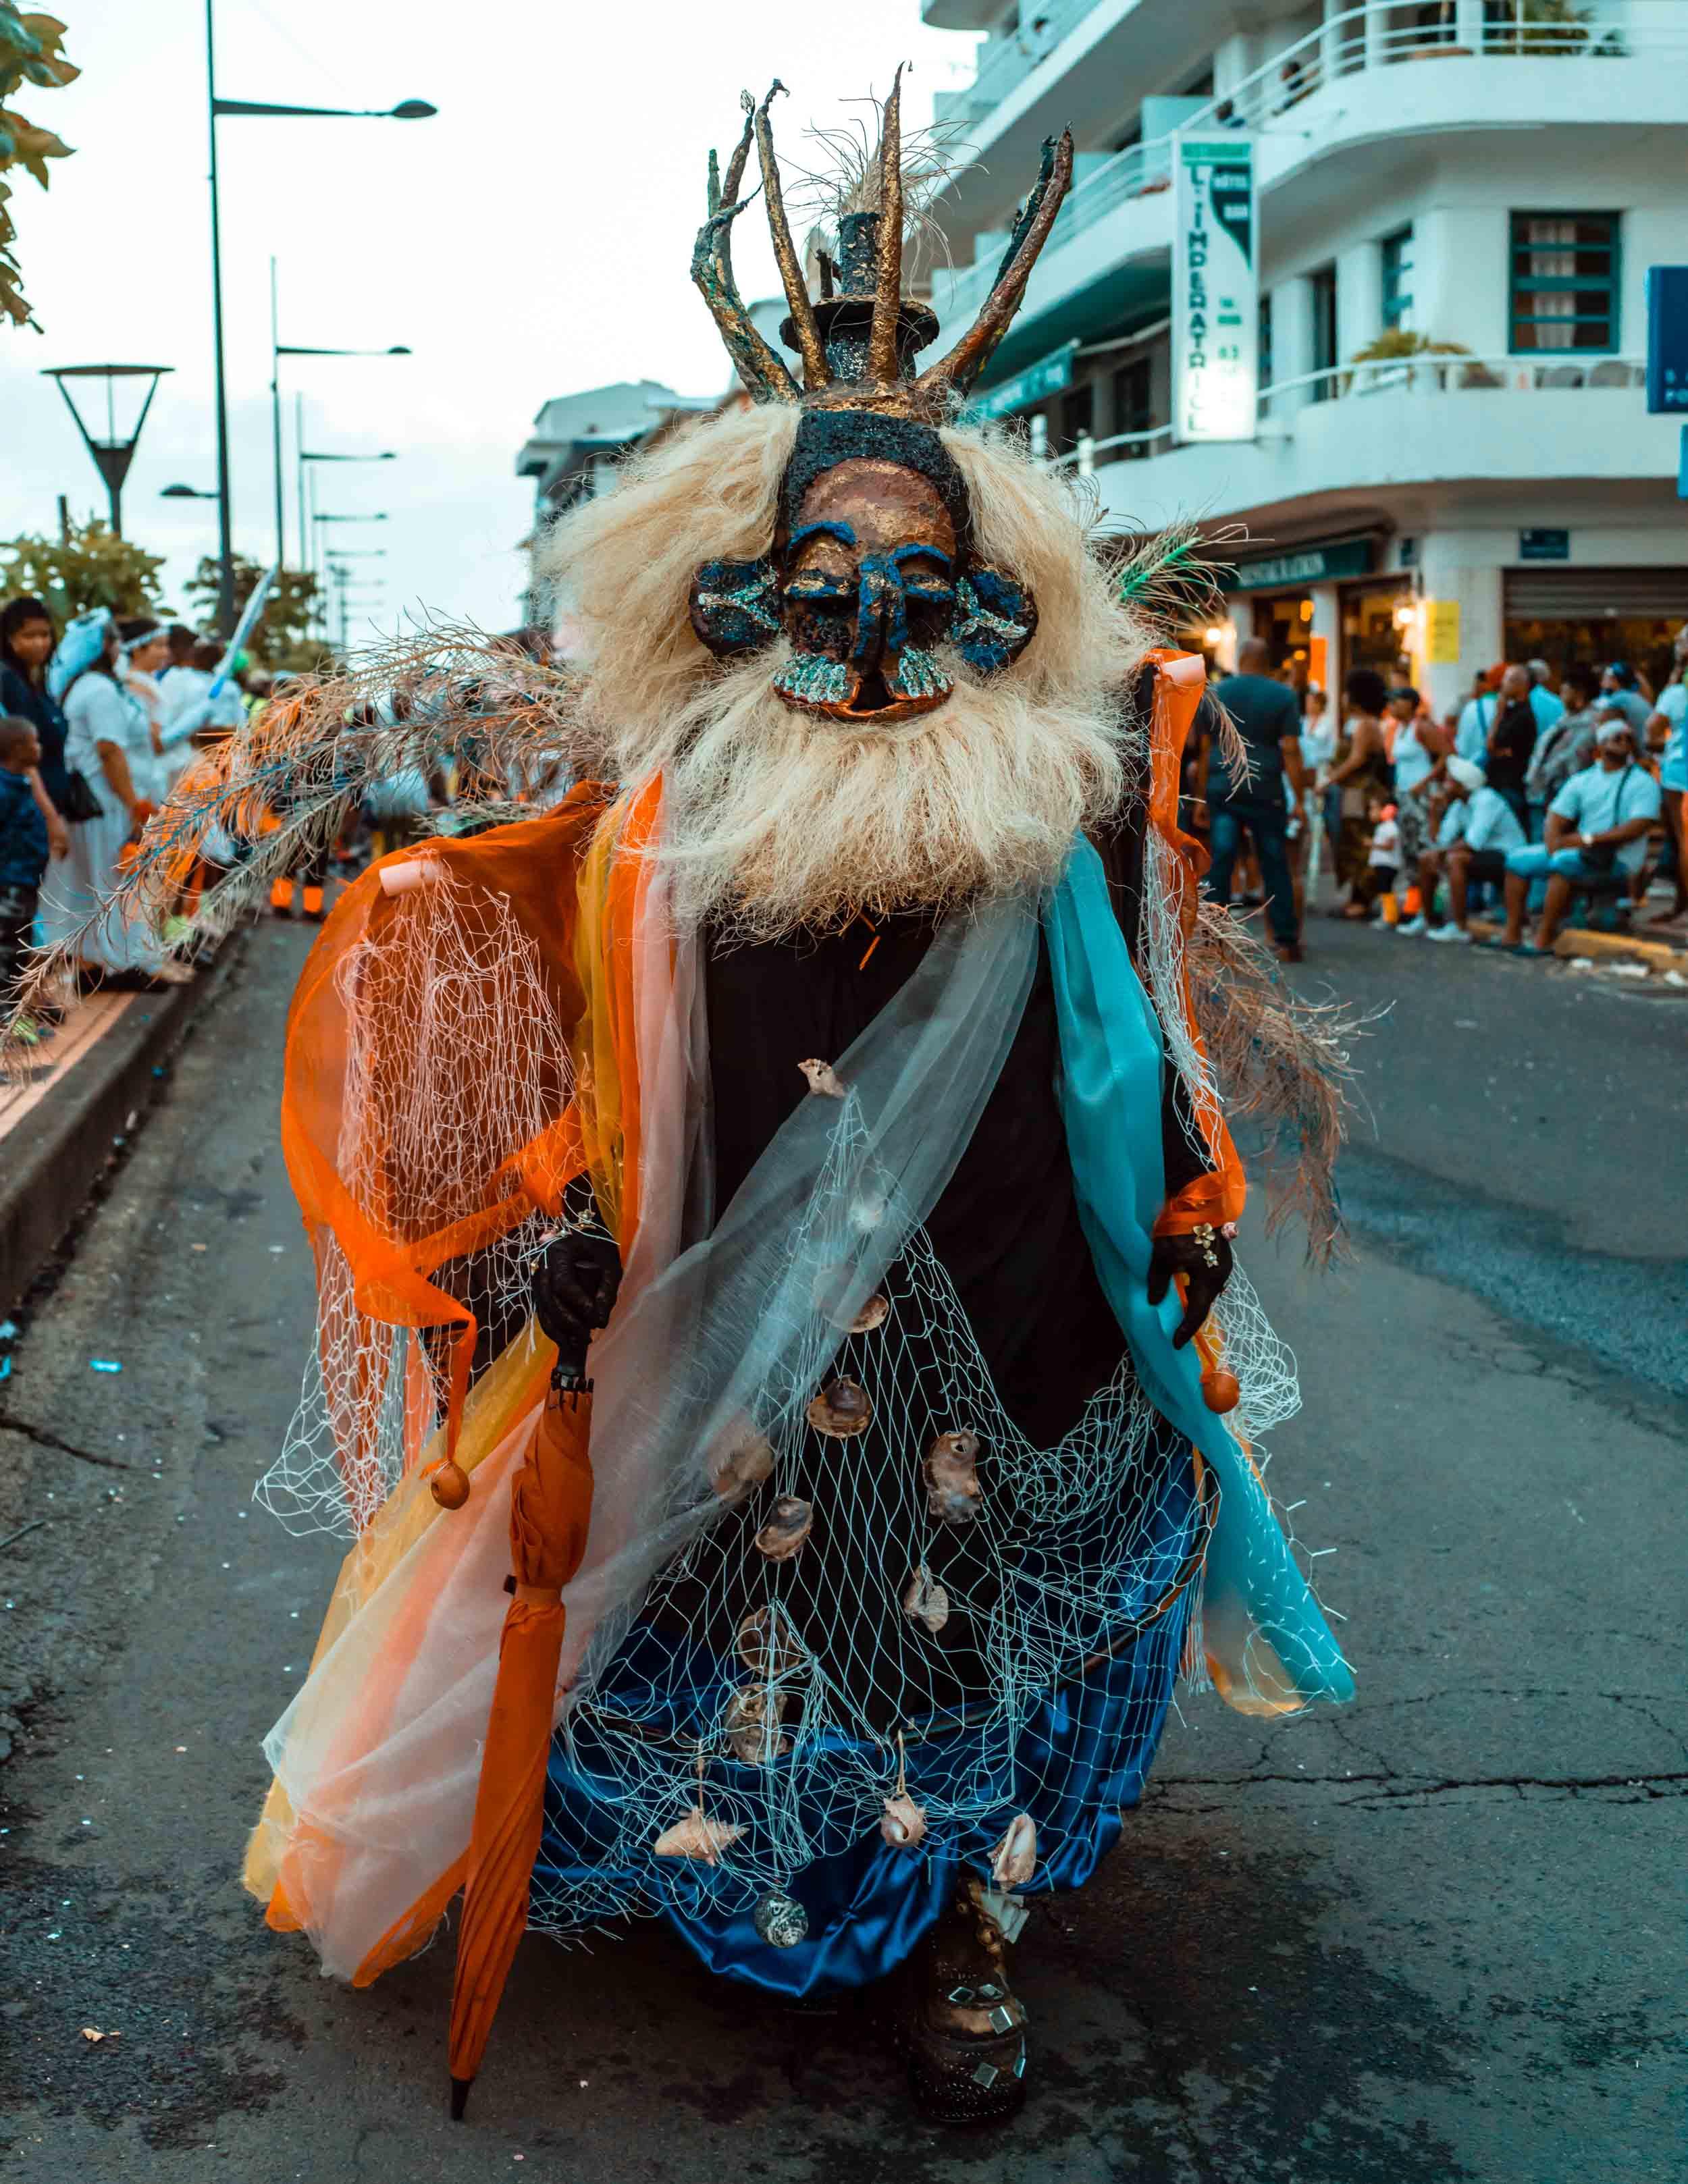 180212_SK_Martinique-35.jpg